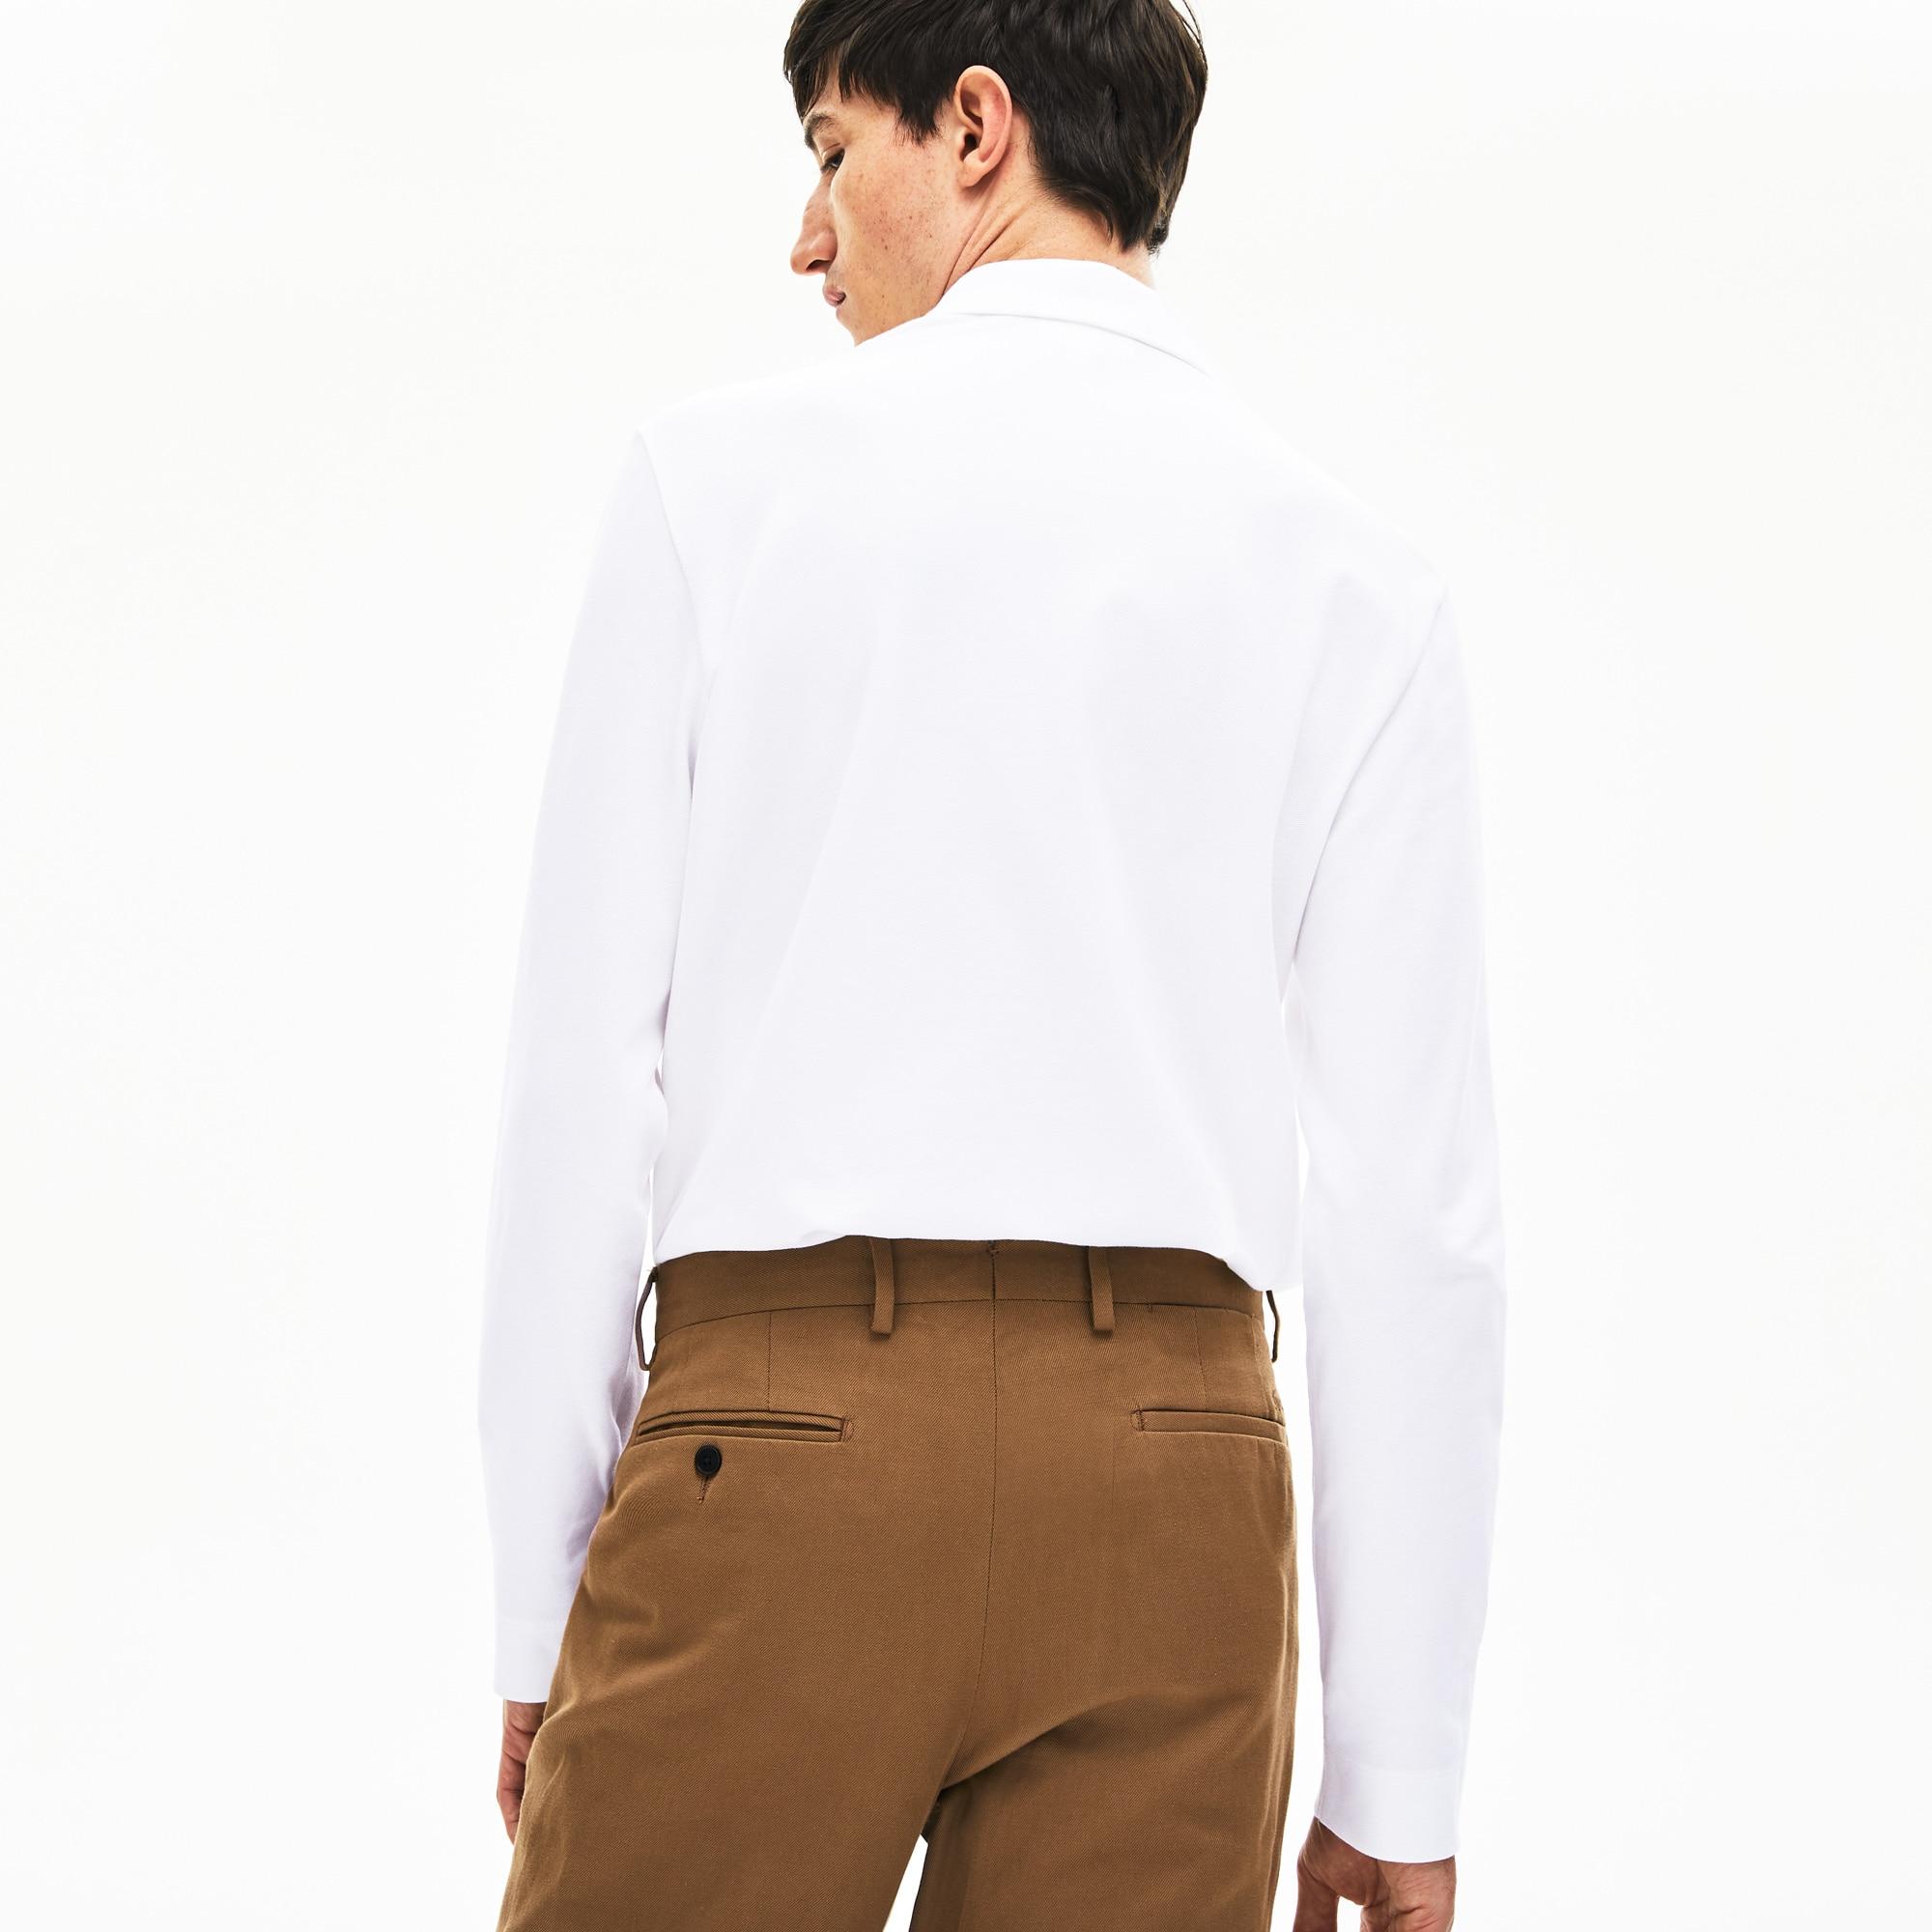 Fit Sleeve Men's Shirt Long Stretch Paris Regular Lacoste Polo T3FJclK1